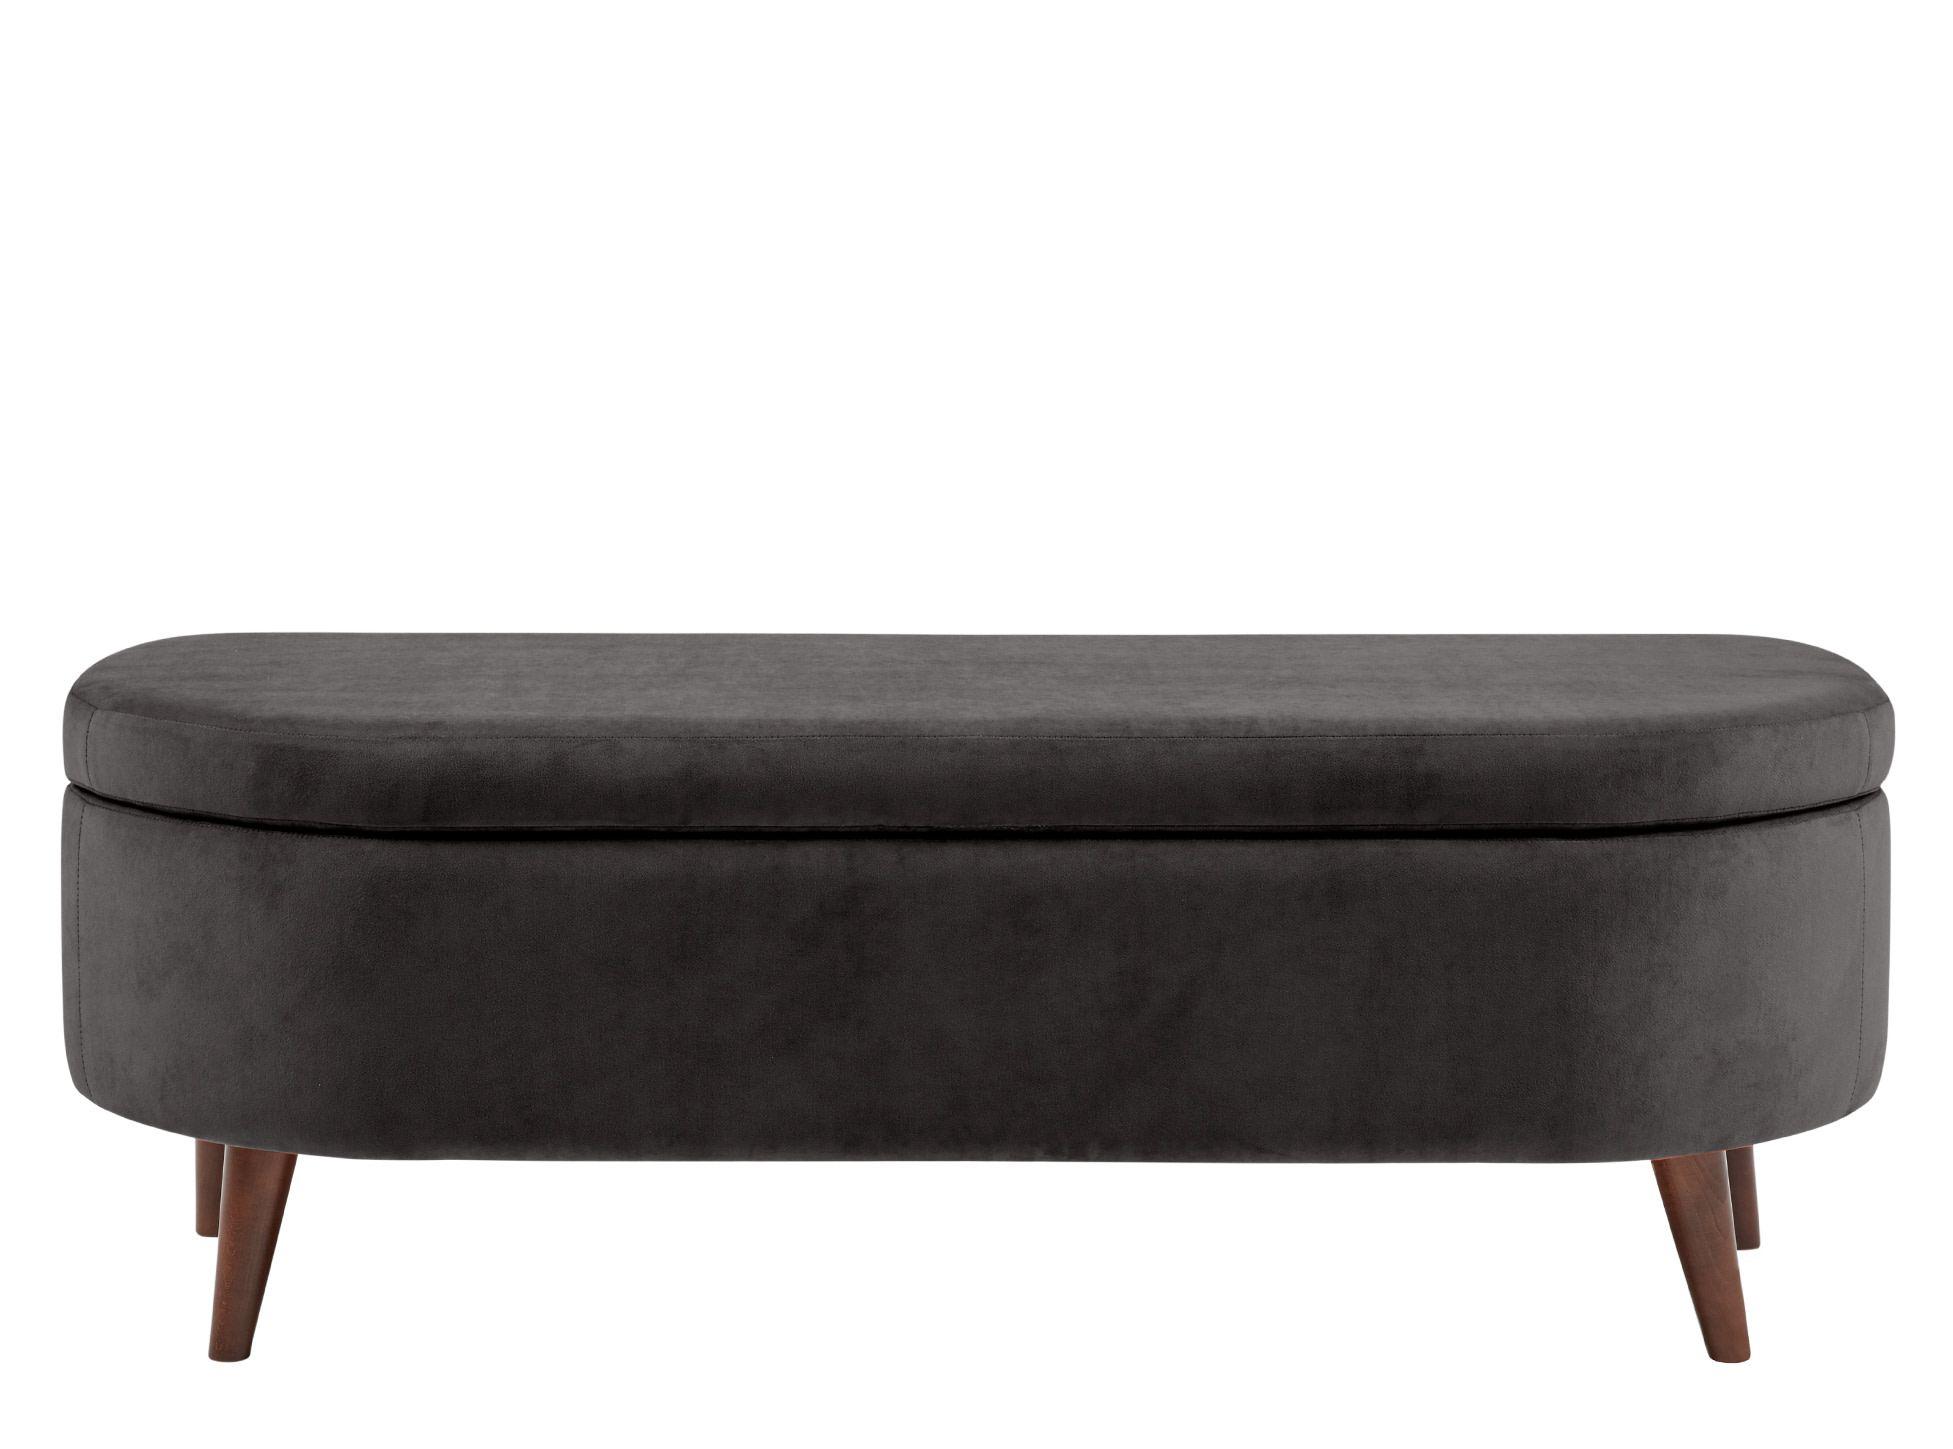 Lulu Ottoman Bench, Asphalt Grey Velvet